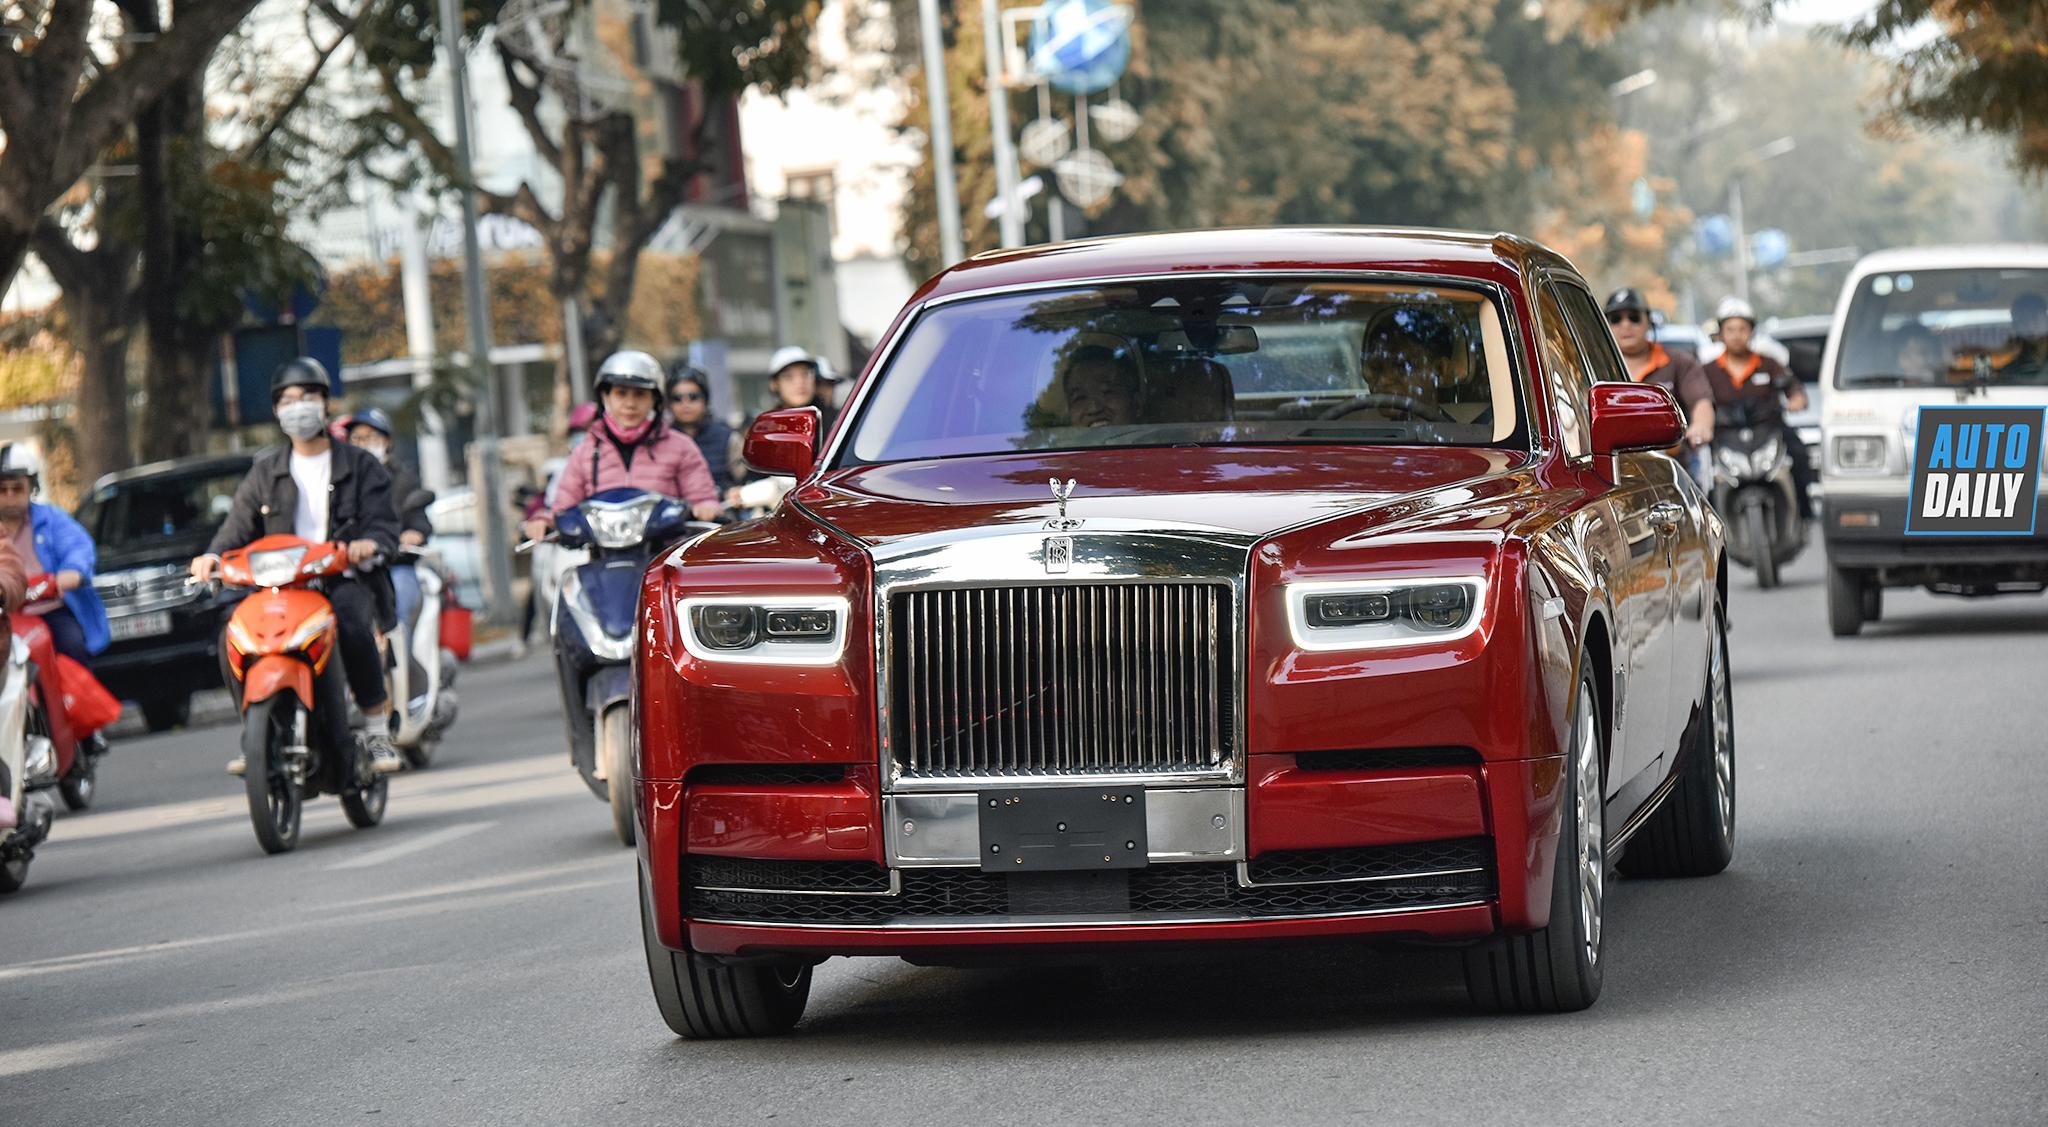 rolls-royce-phantom-2018-autodaily-25.jpg